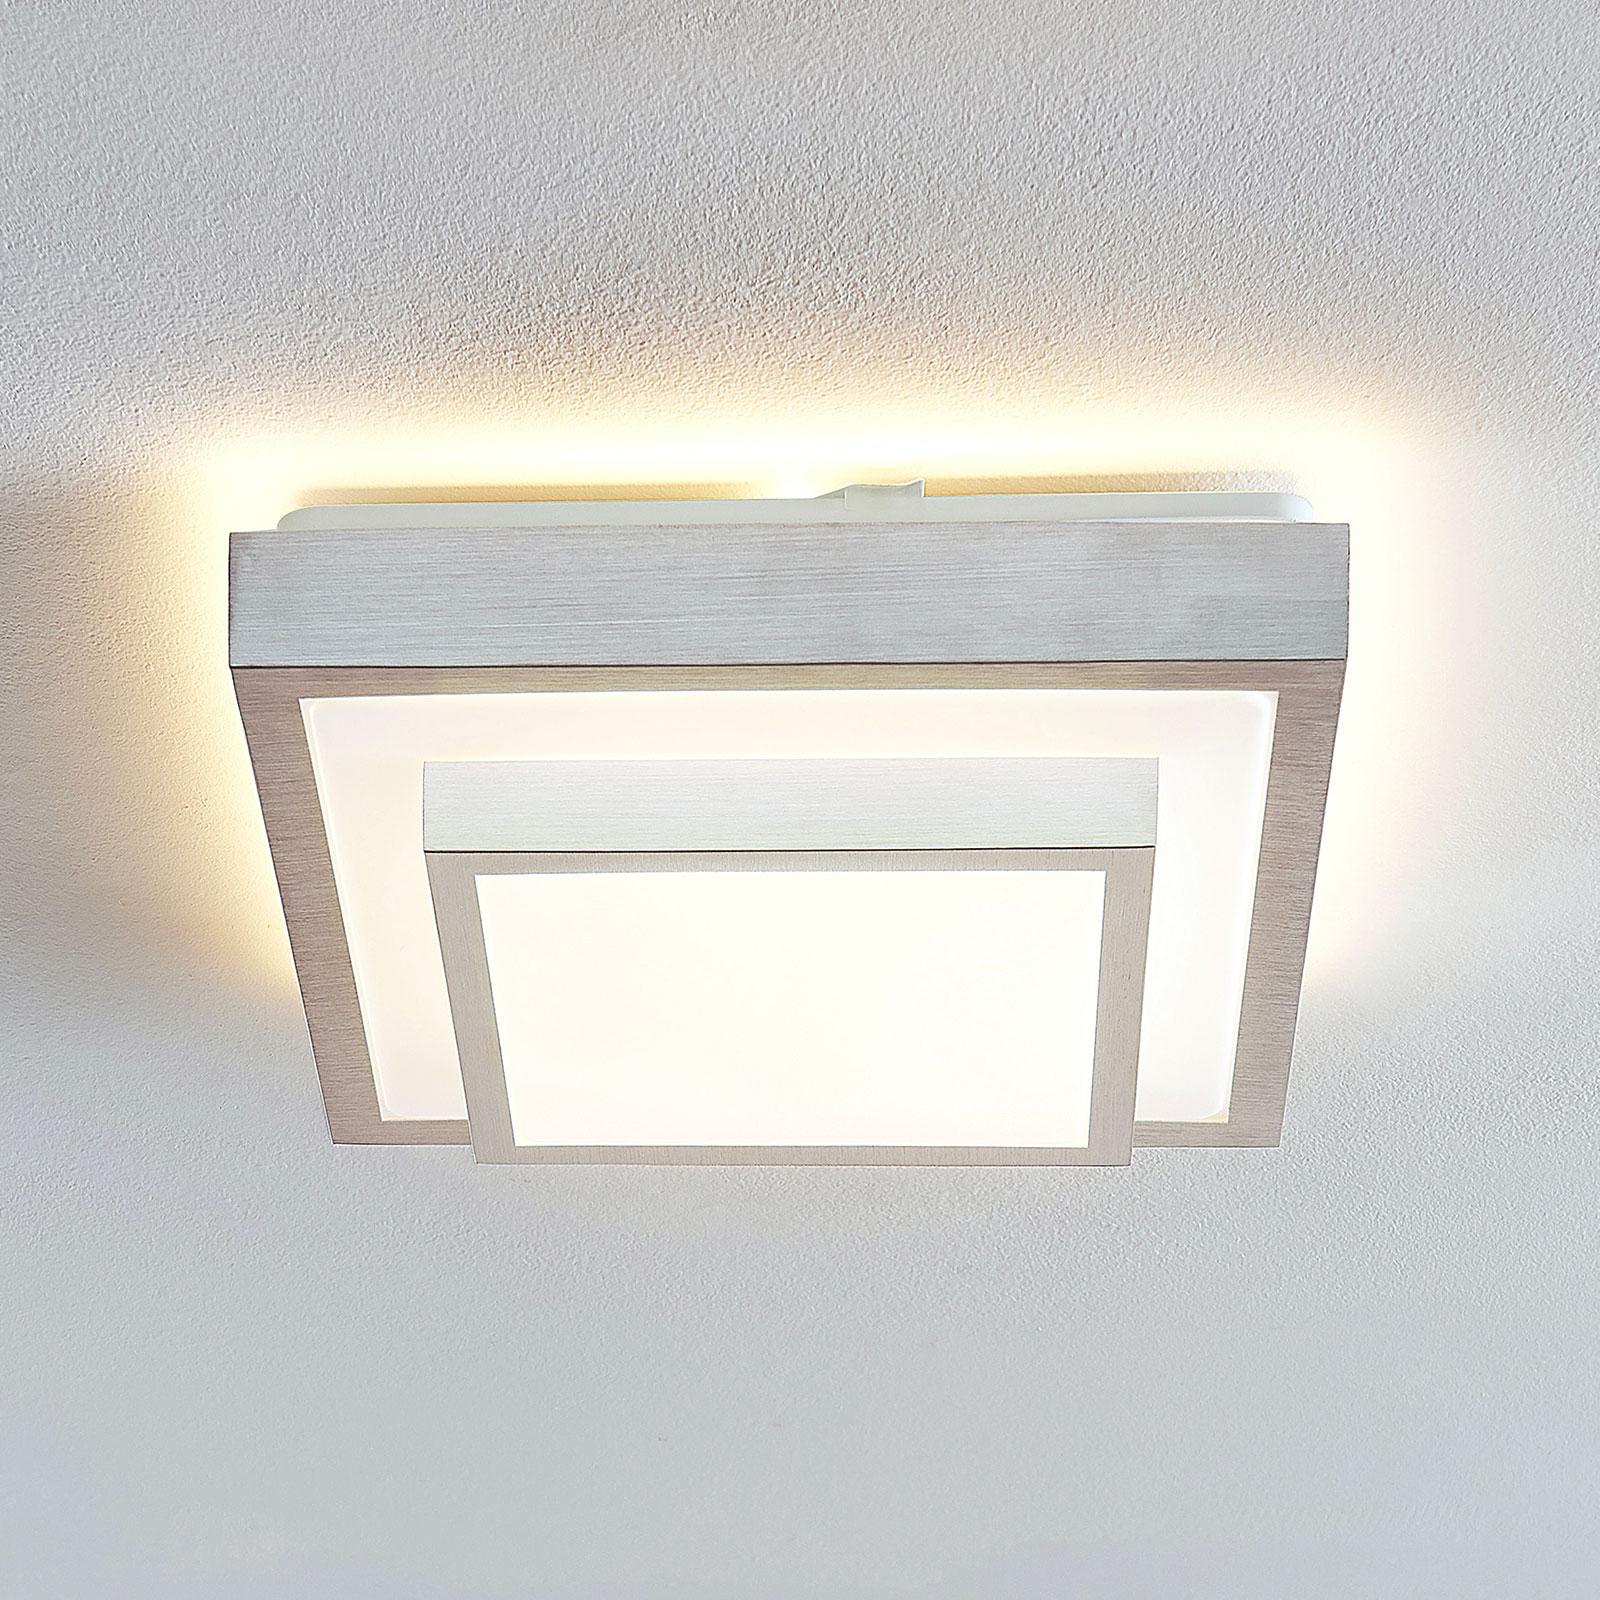 Lindby Mirco plafonnier LED angulaire, 32 cm